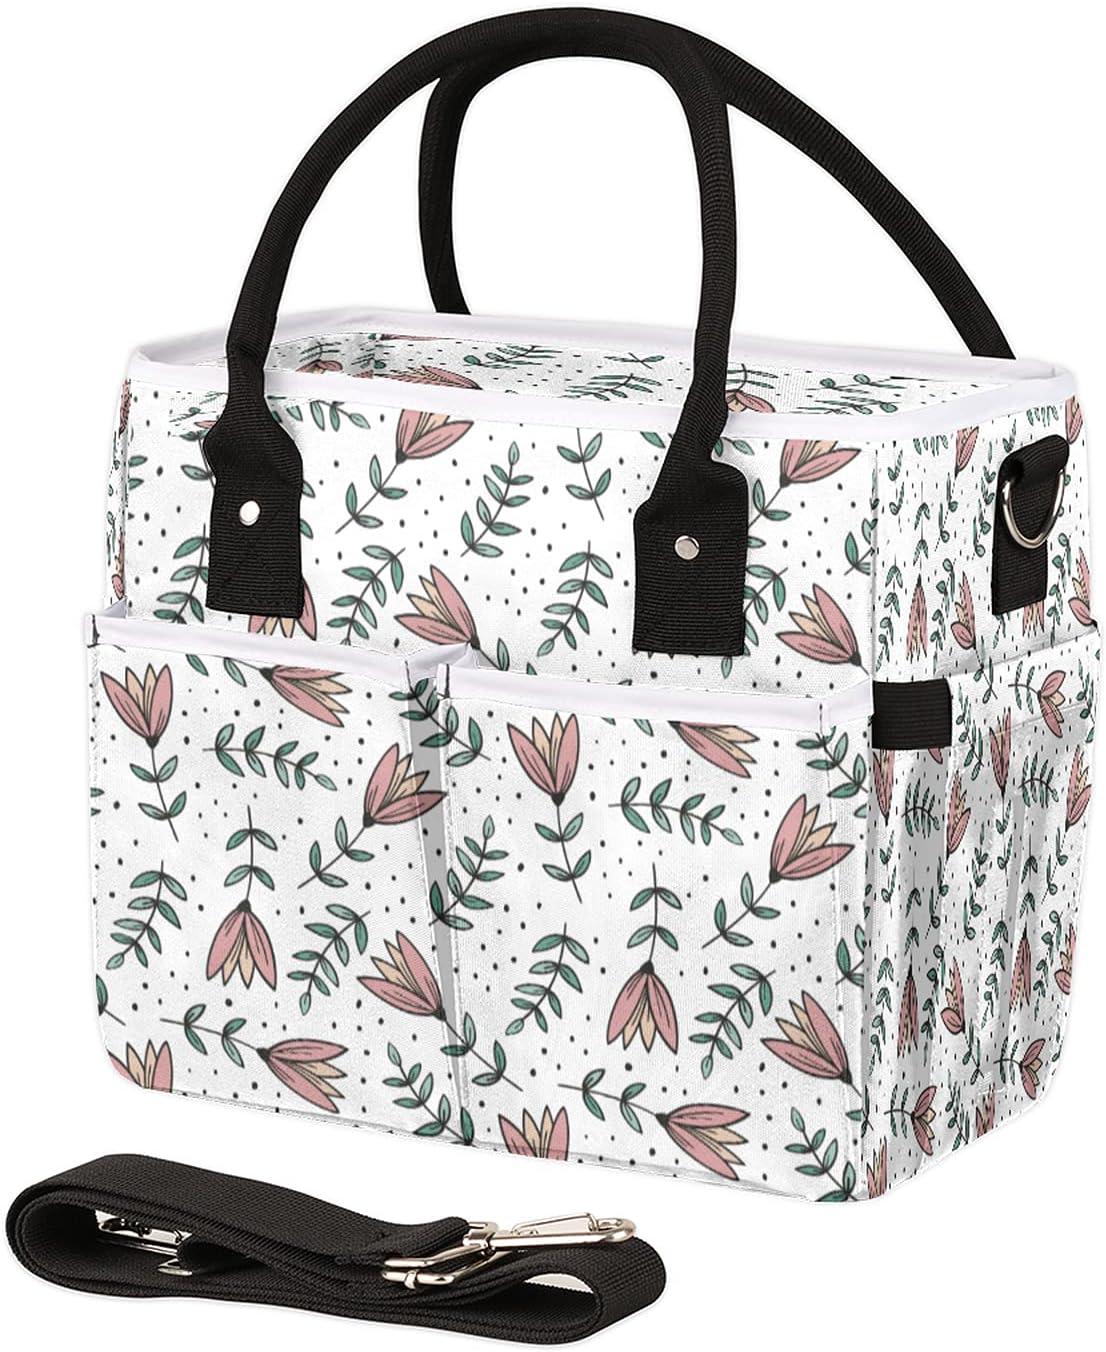 shipfree Insulated Lunch Bag for Women Men Le Polka online shopping Dot Flowers Beautiful